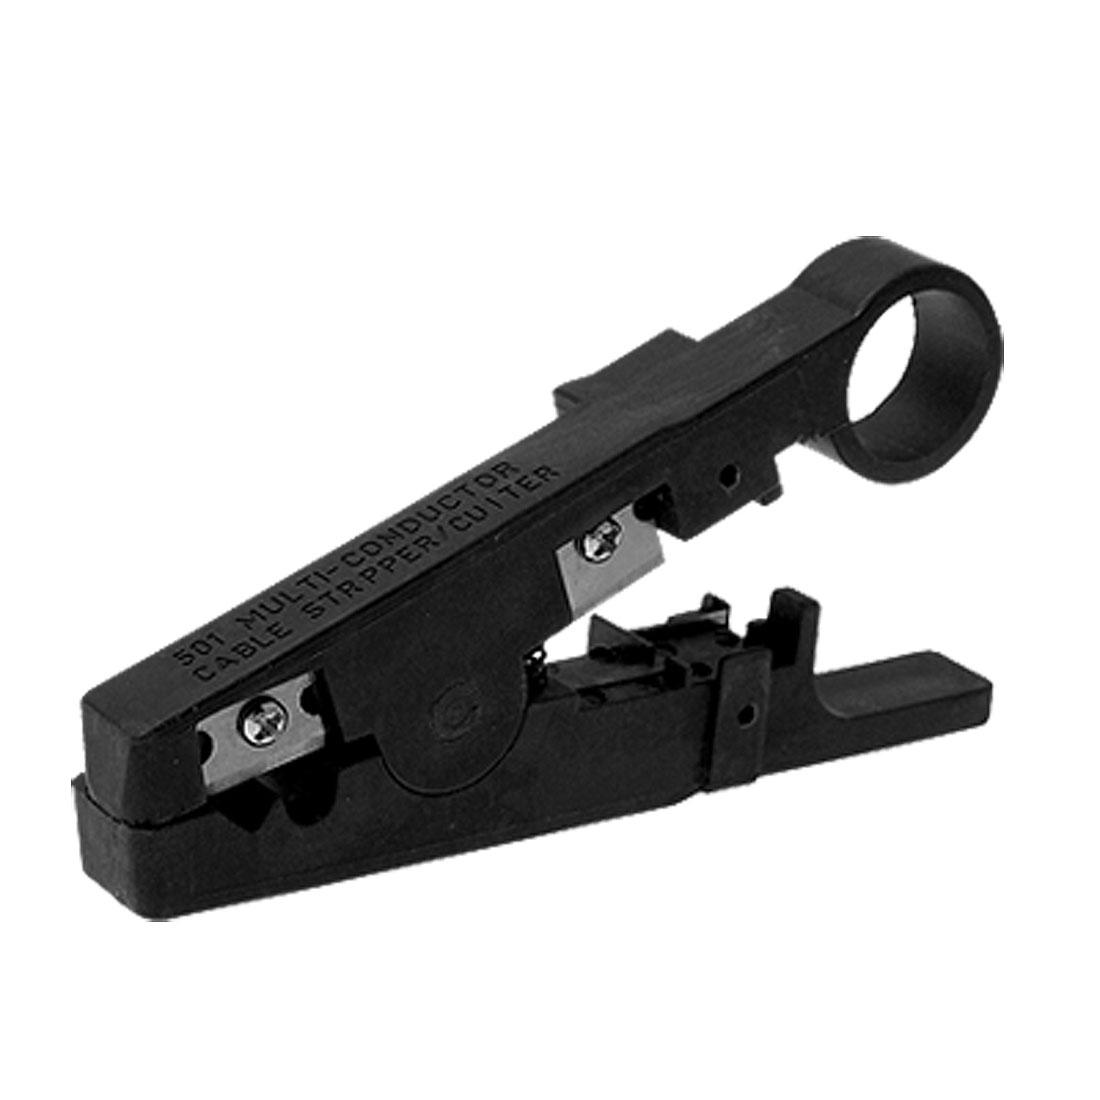 Unique Bargains Portable Resin Wire Cutting Cutter Stripper Plier Black